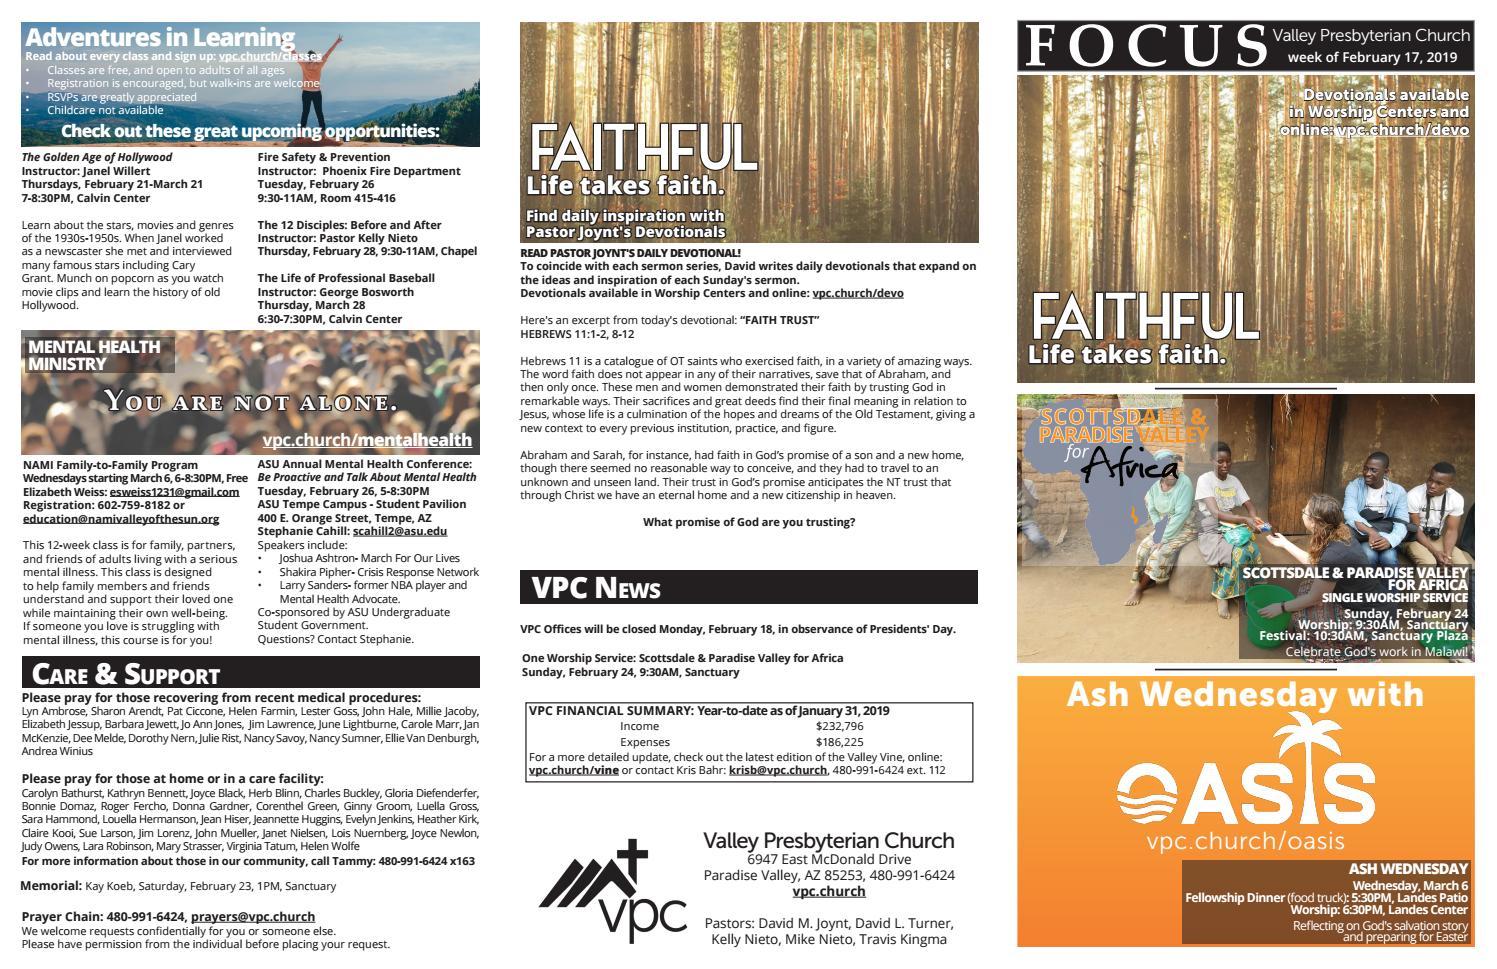 Focus 02-17-2019 by Valley Presbyterian Church - issuu